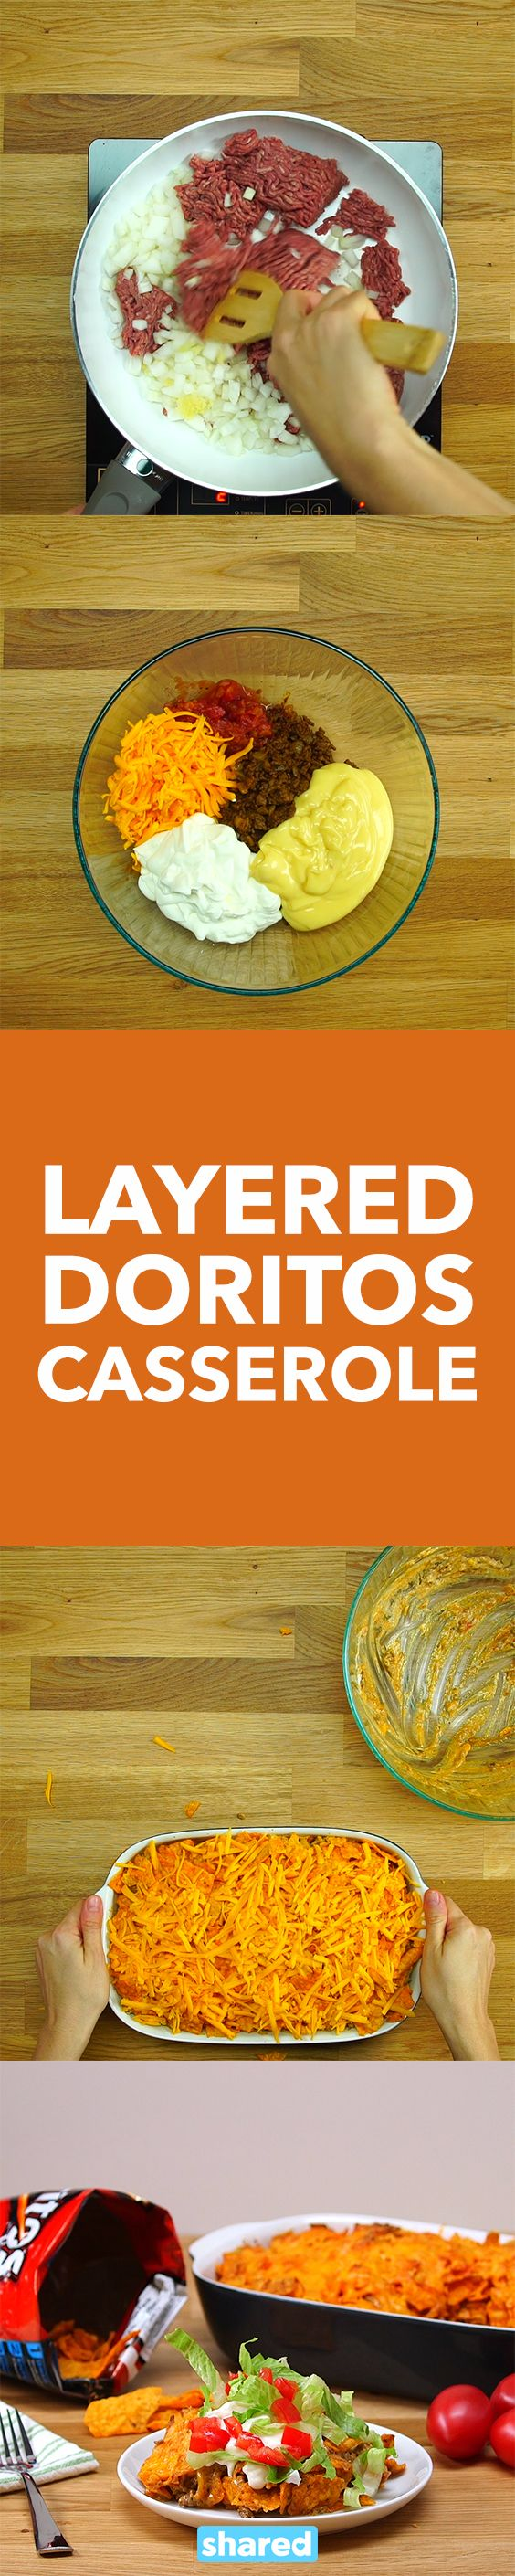 Layered Doritos Casserole